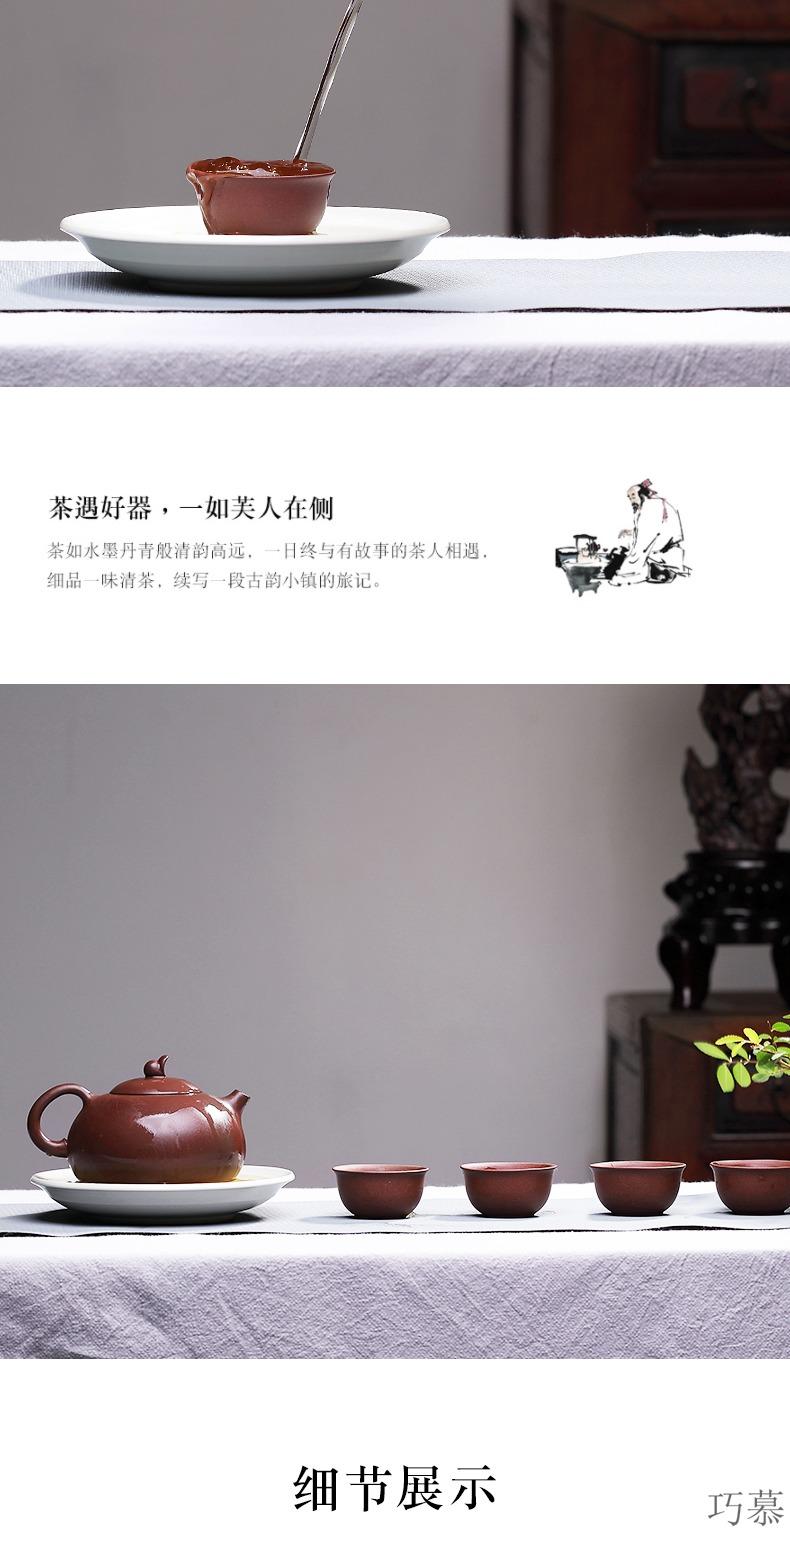 Qiao mu YH yixing it all pure hand undressed ore teapot creative shih purple clay pot of kung fu tea set